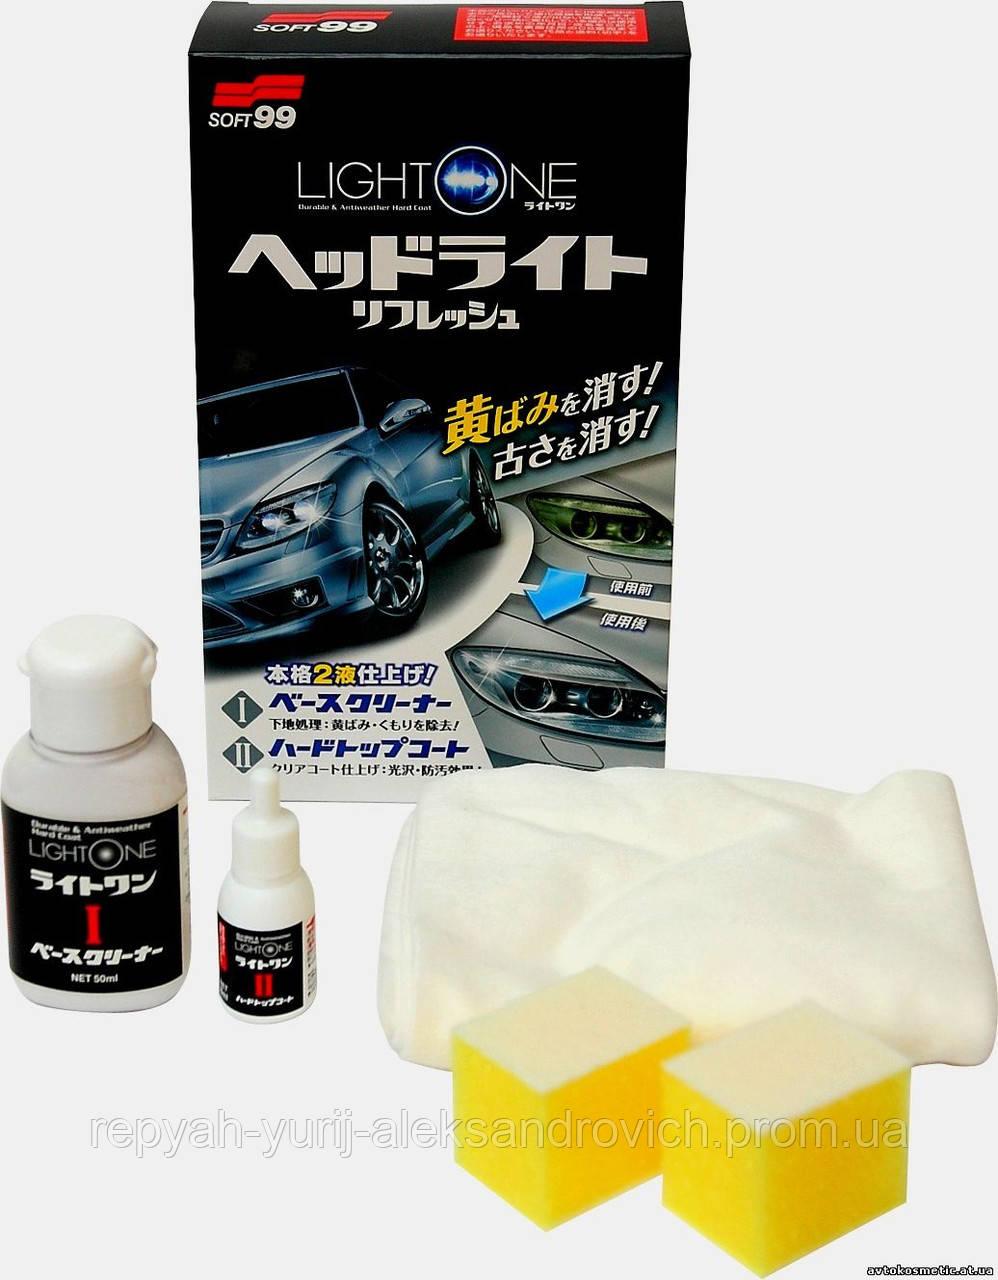 Восстановитель для фар Soft99 Light One 8 мл + 50 мл